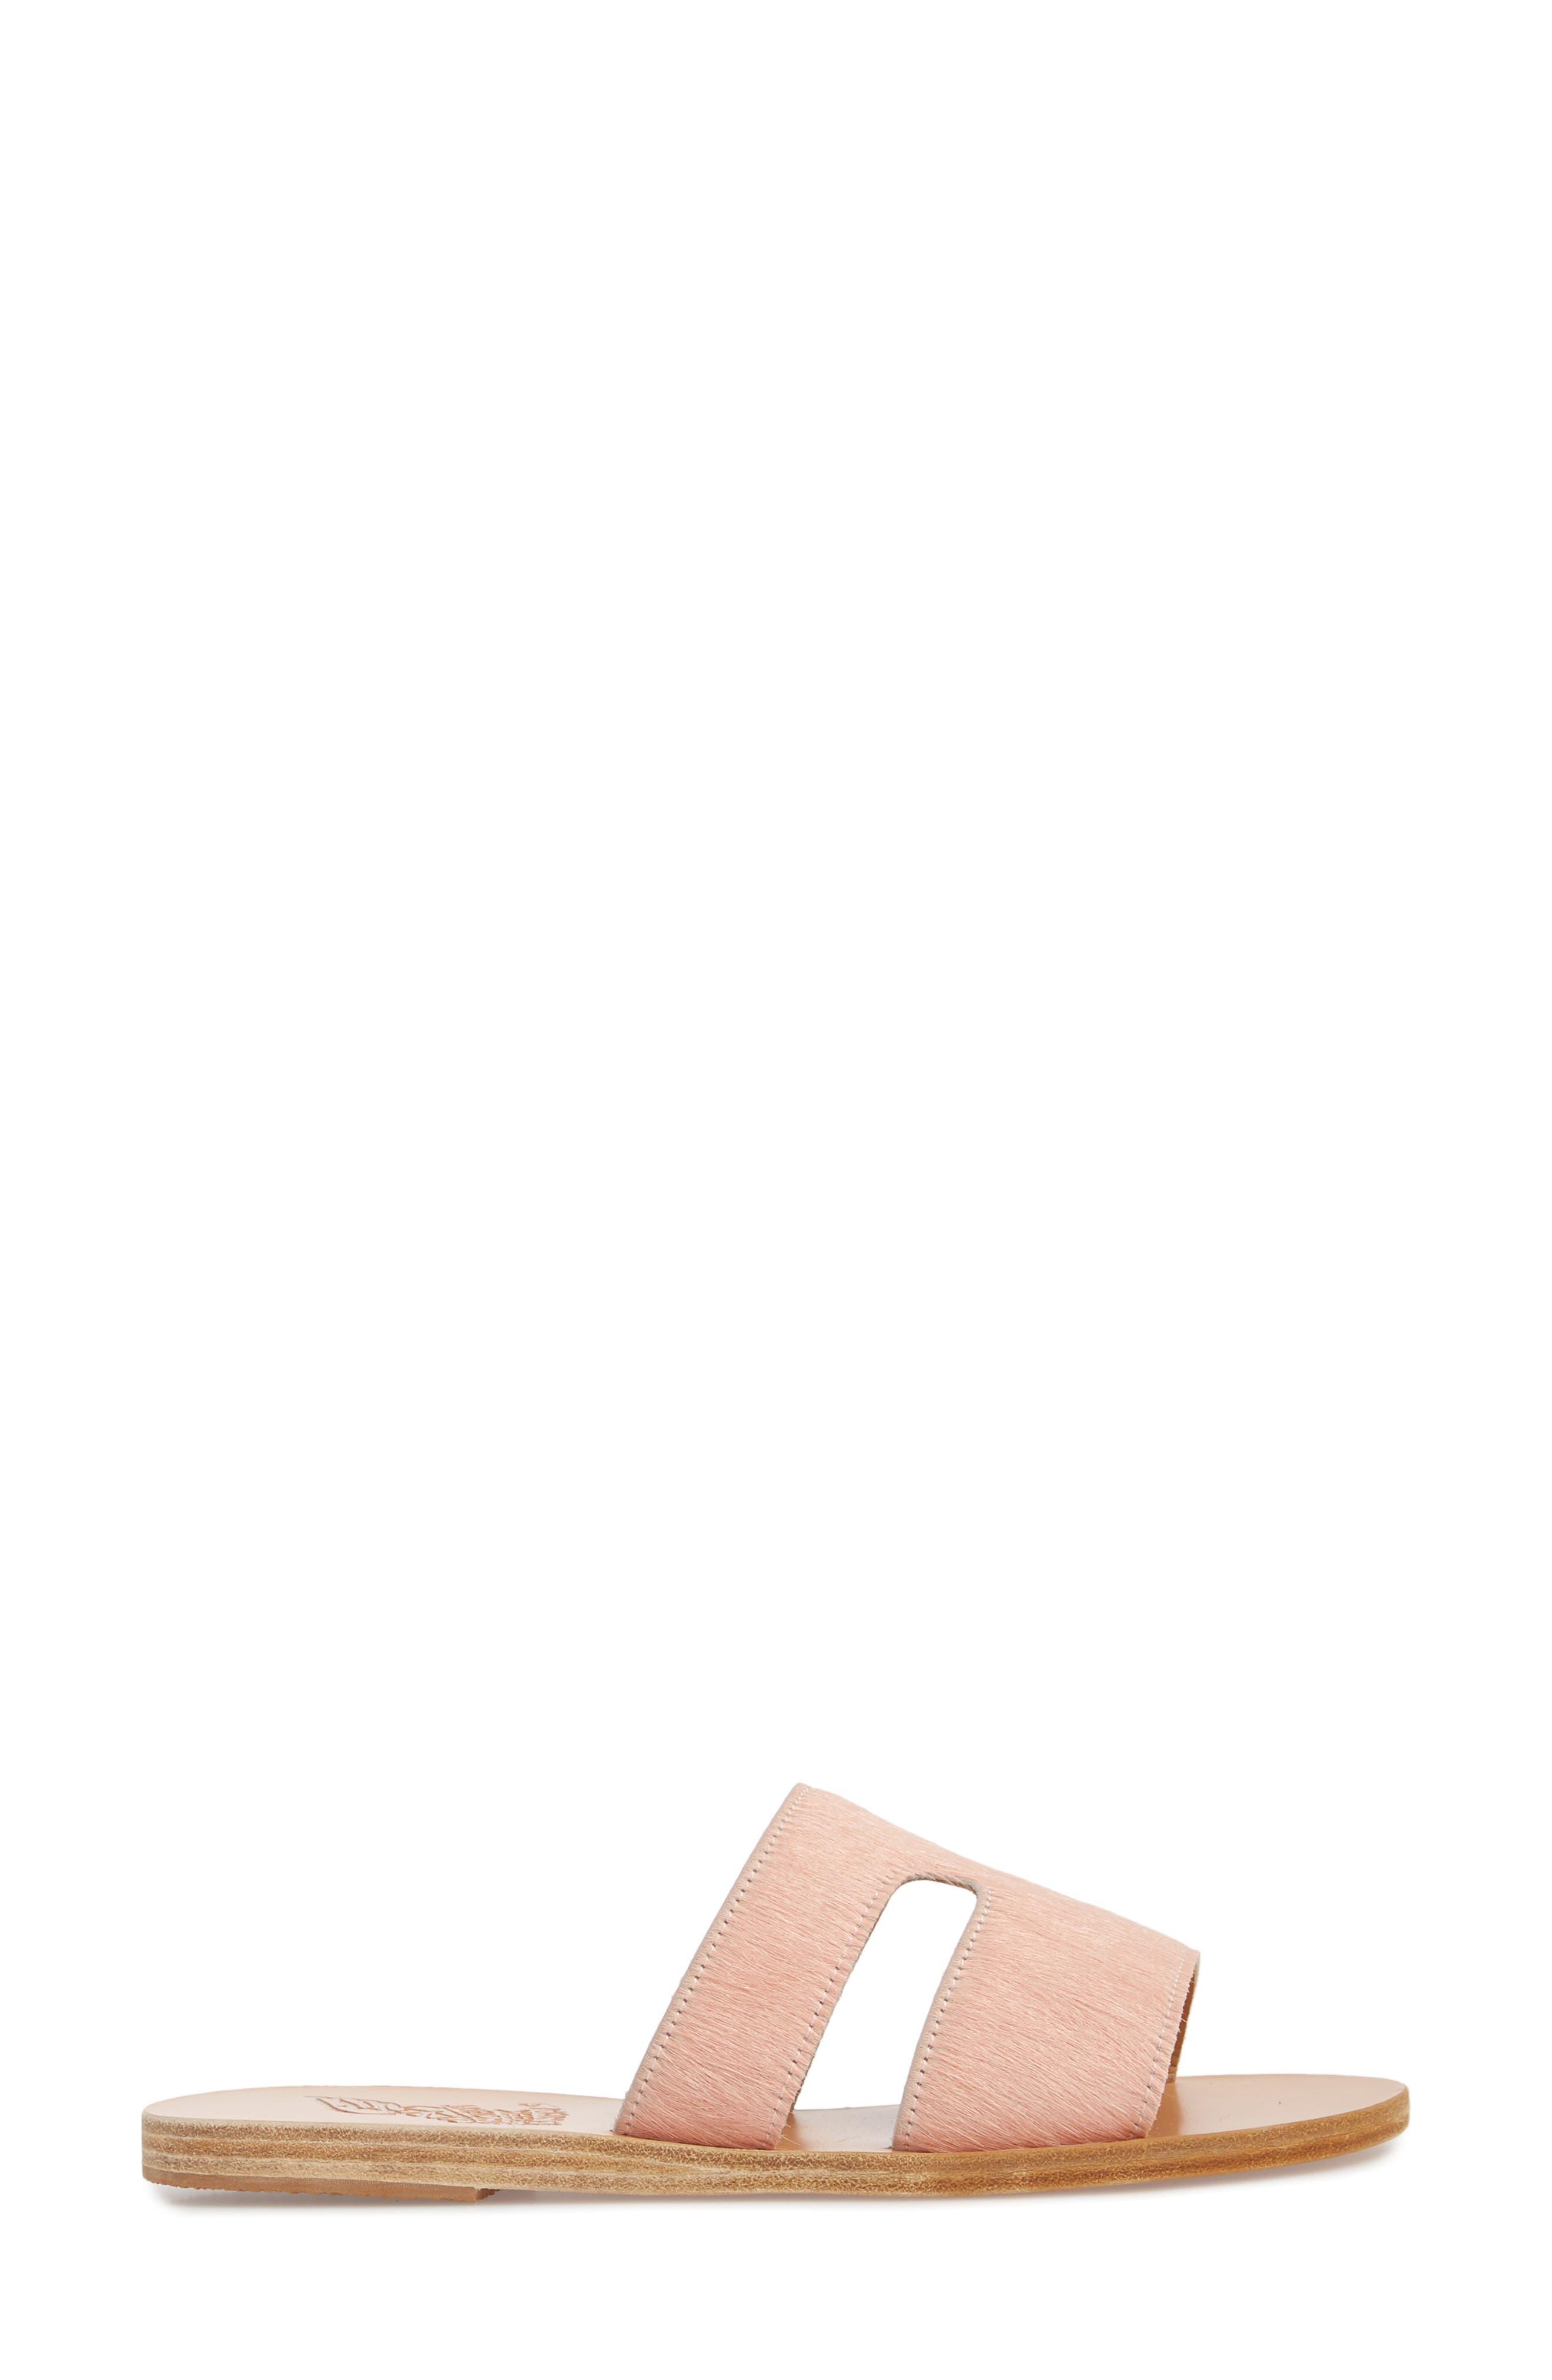 Apteros Genuine Calf Hair Slide Sandal,                             Alternate thumbnail 3, color,                             Pink Pony